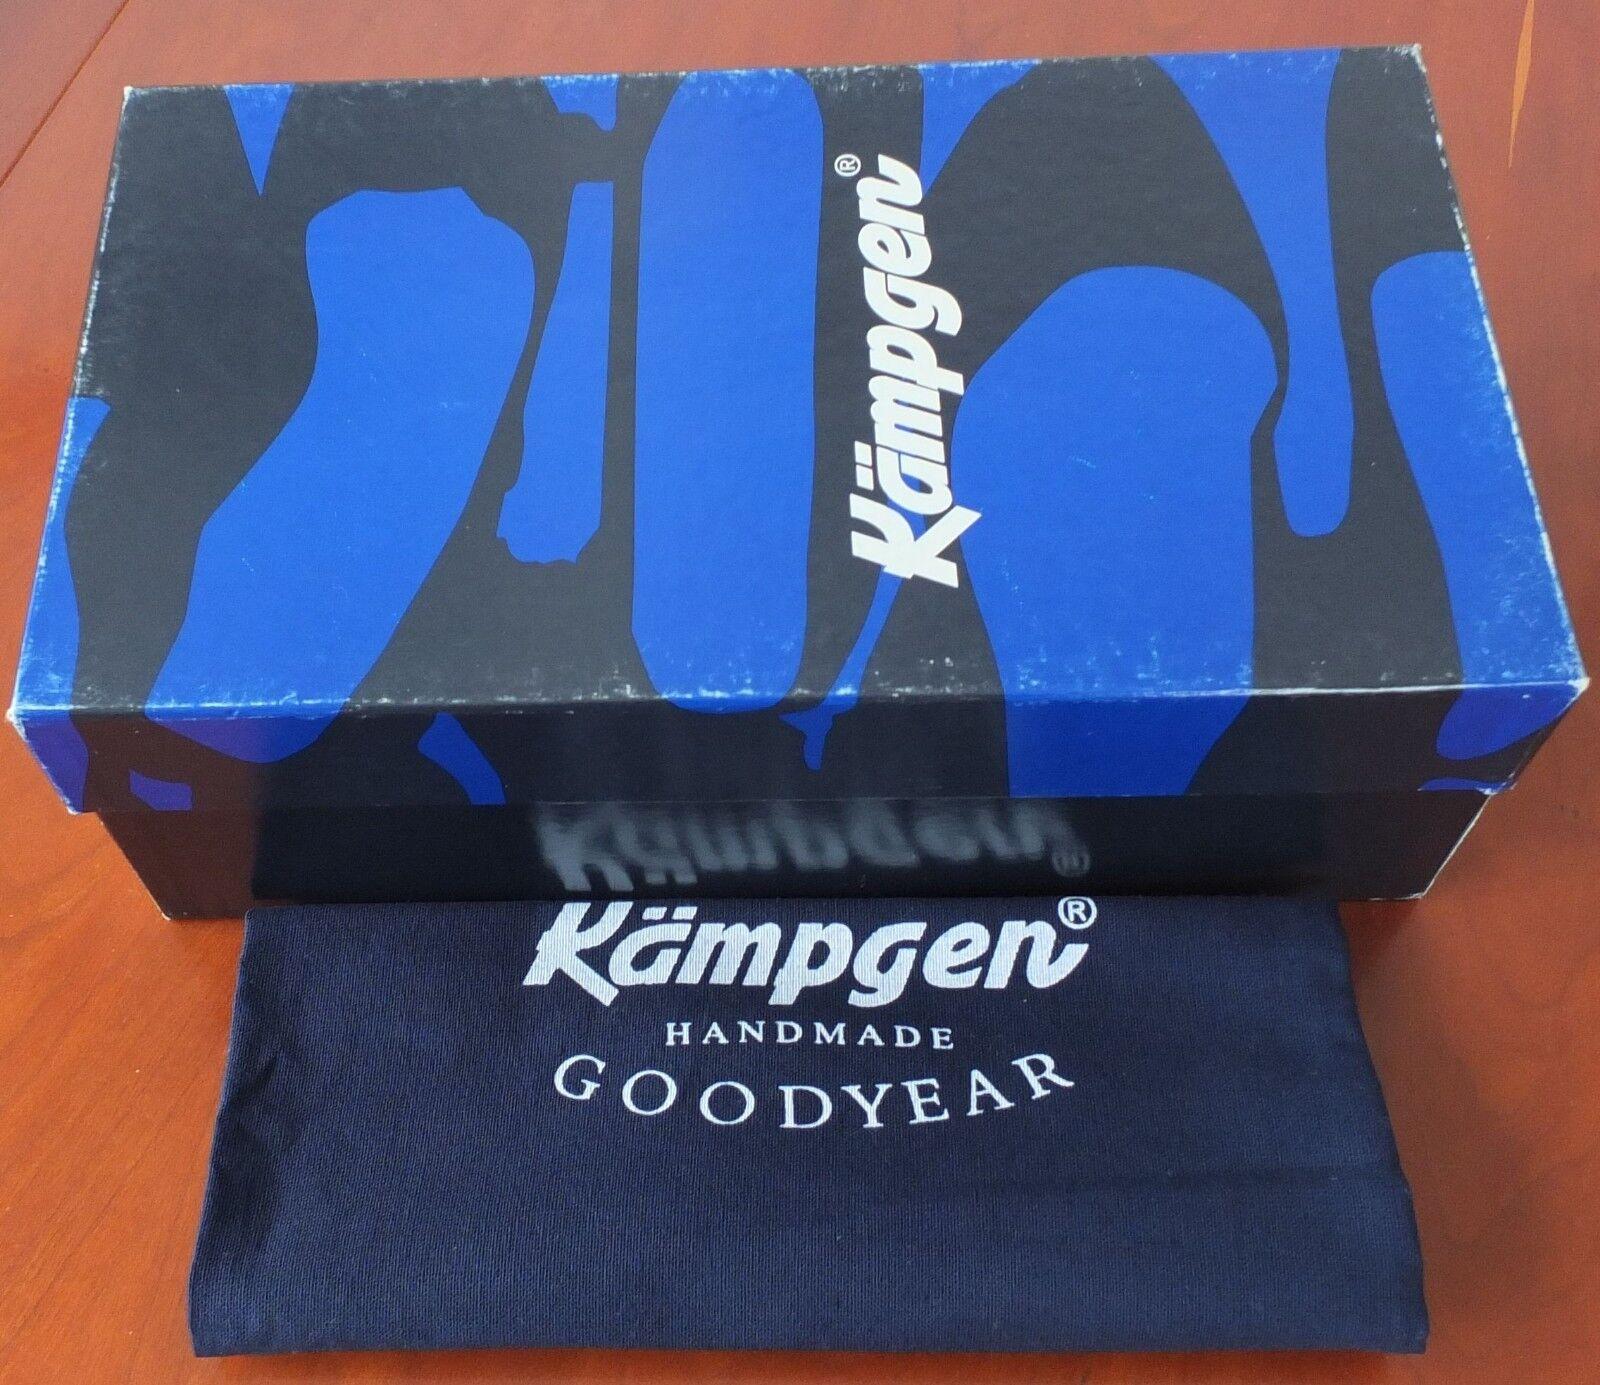 Original Kämpgen braun Handmade Goodyear Schuhe Leder braun Kämpgen in Größe 7 neu mit Karton 8f77fd